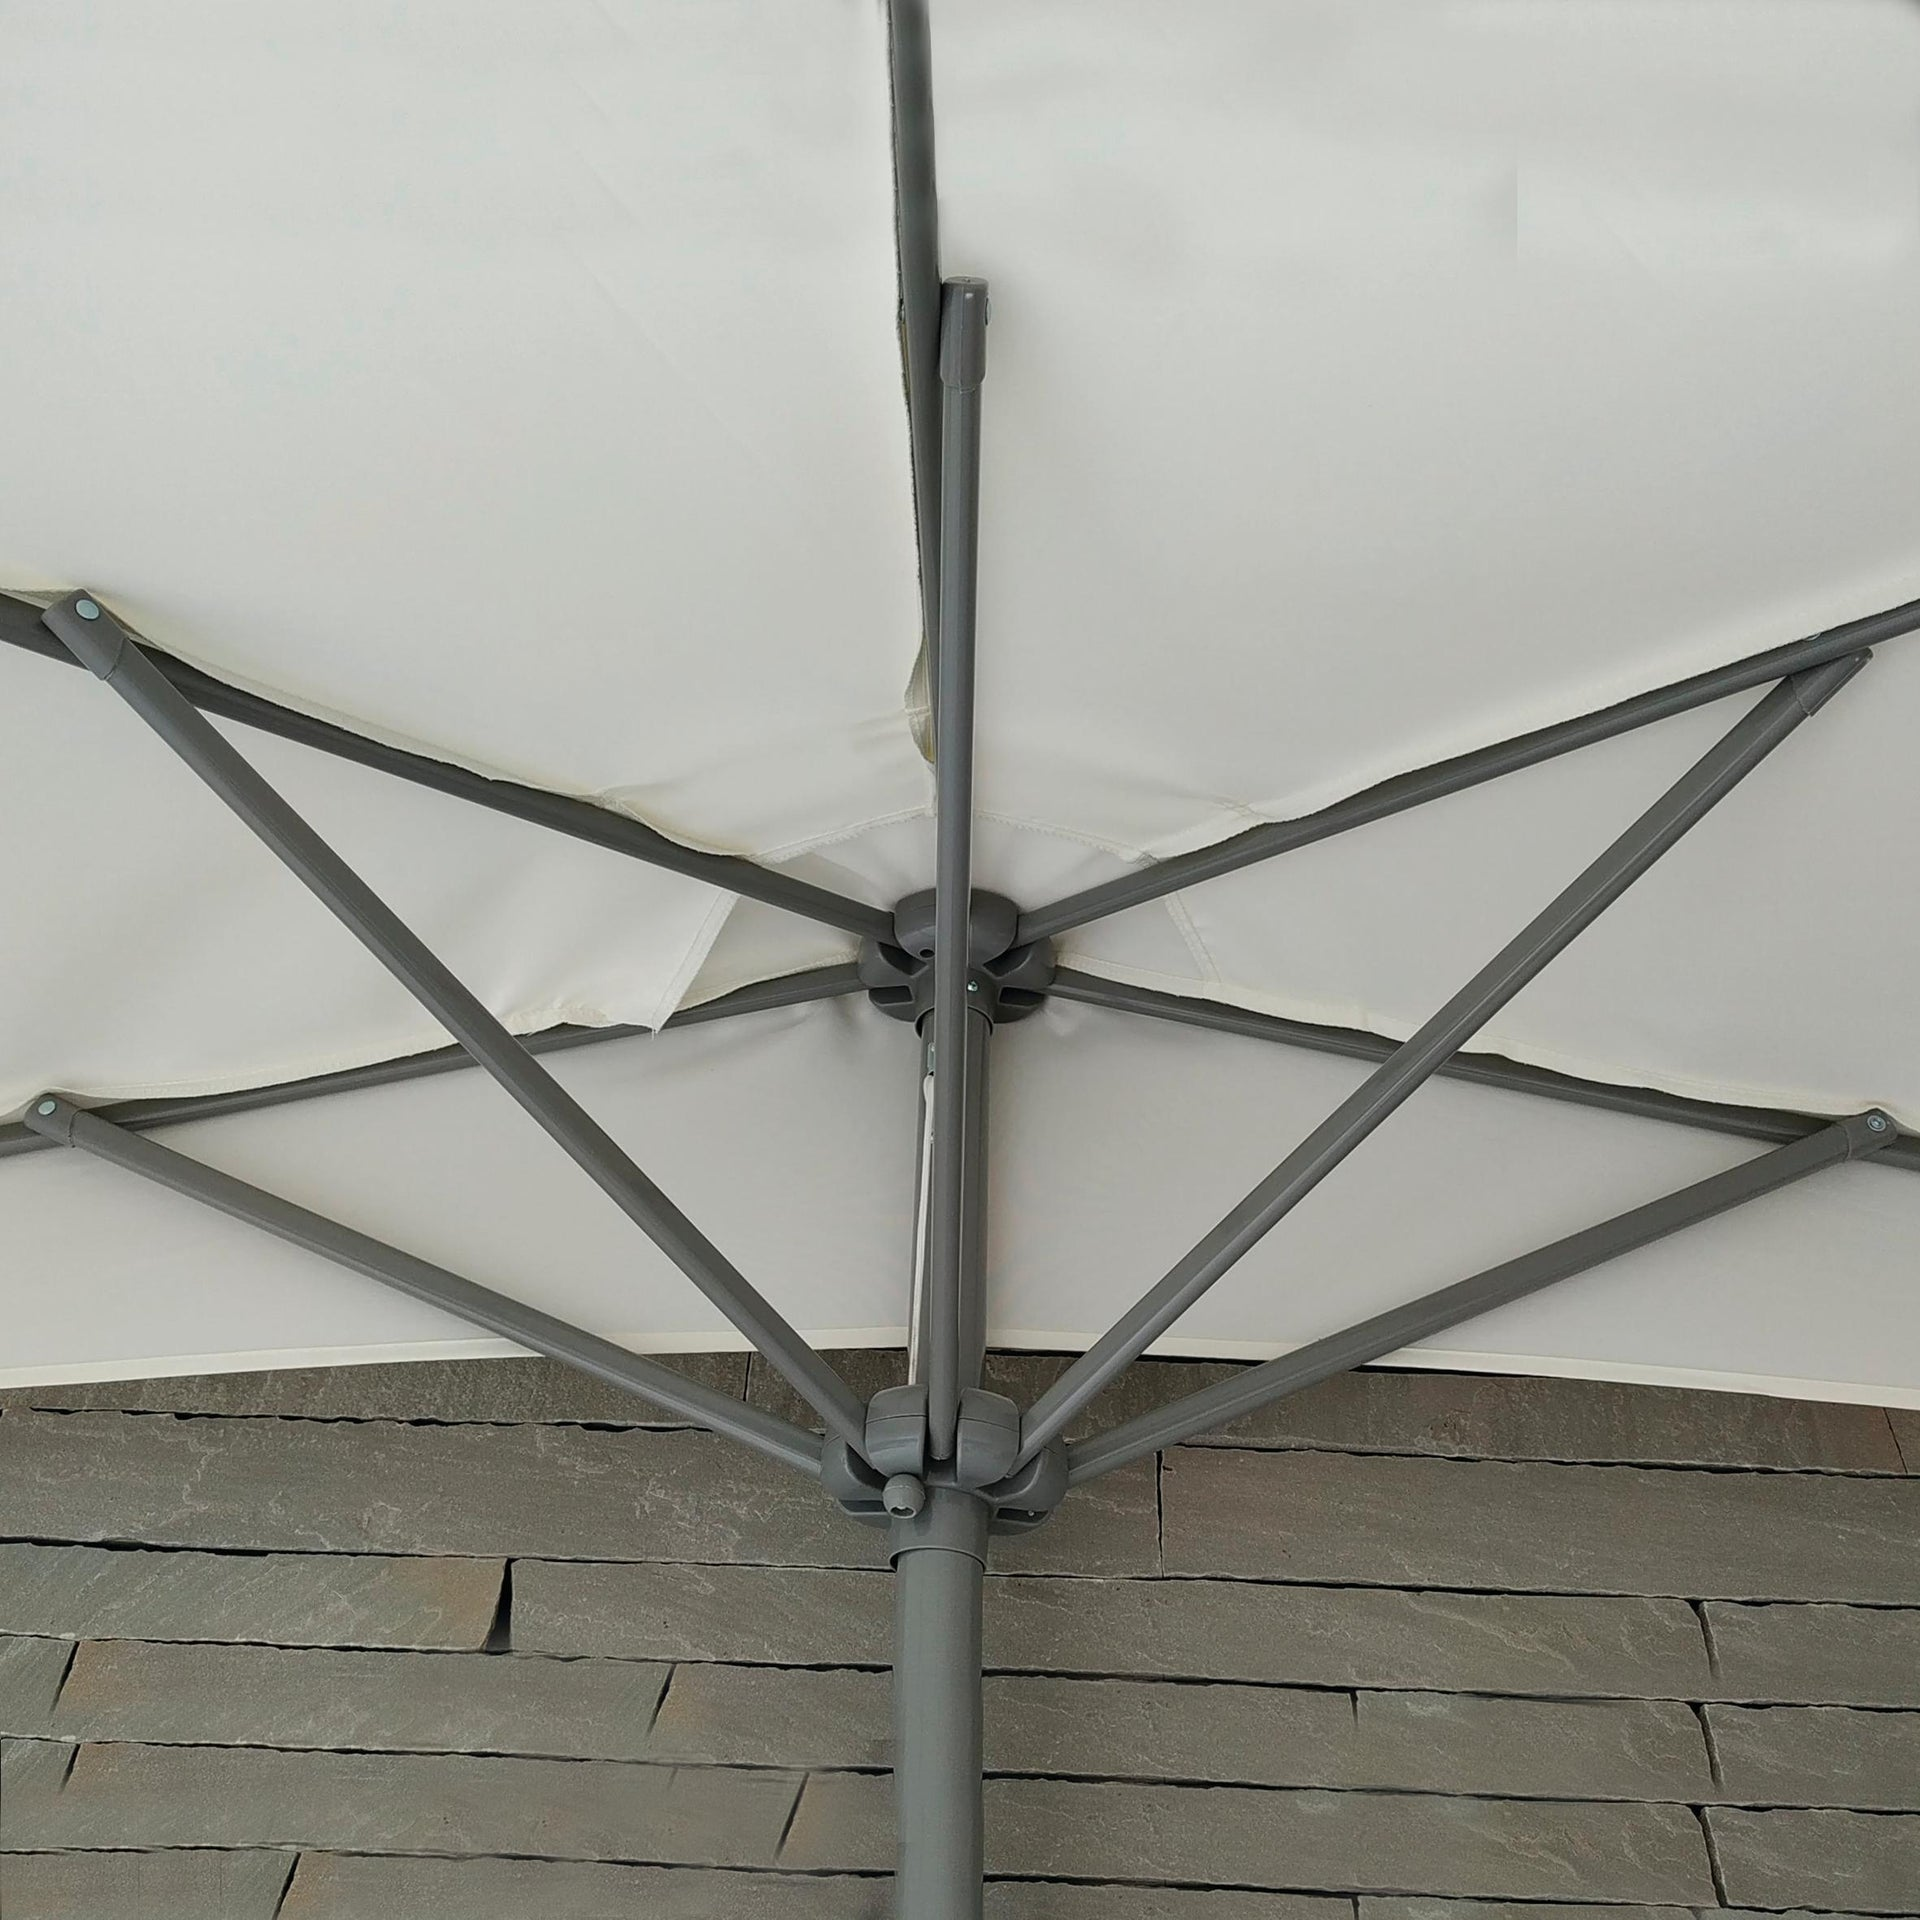 Ombrellone Taormina L 2.7 x P 1.35 m color ecru - 4